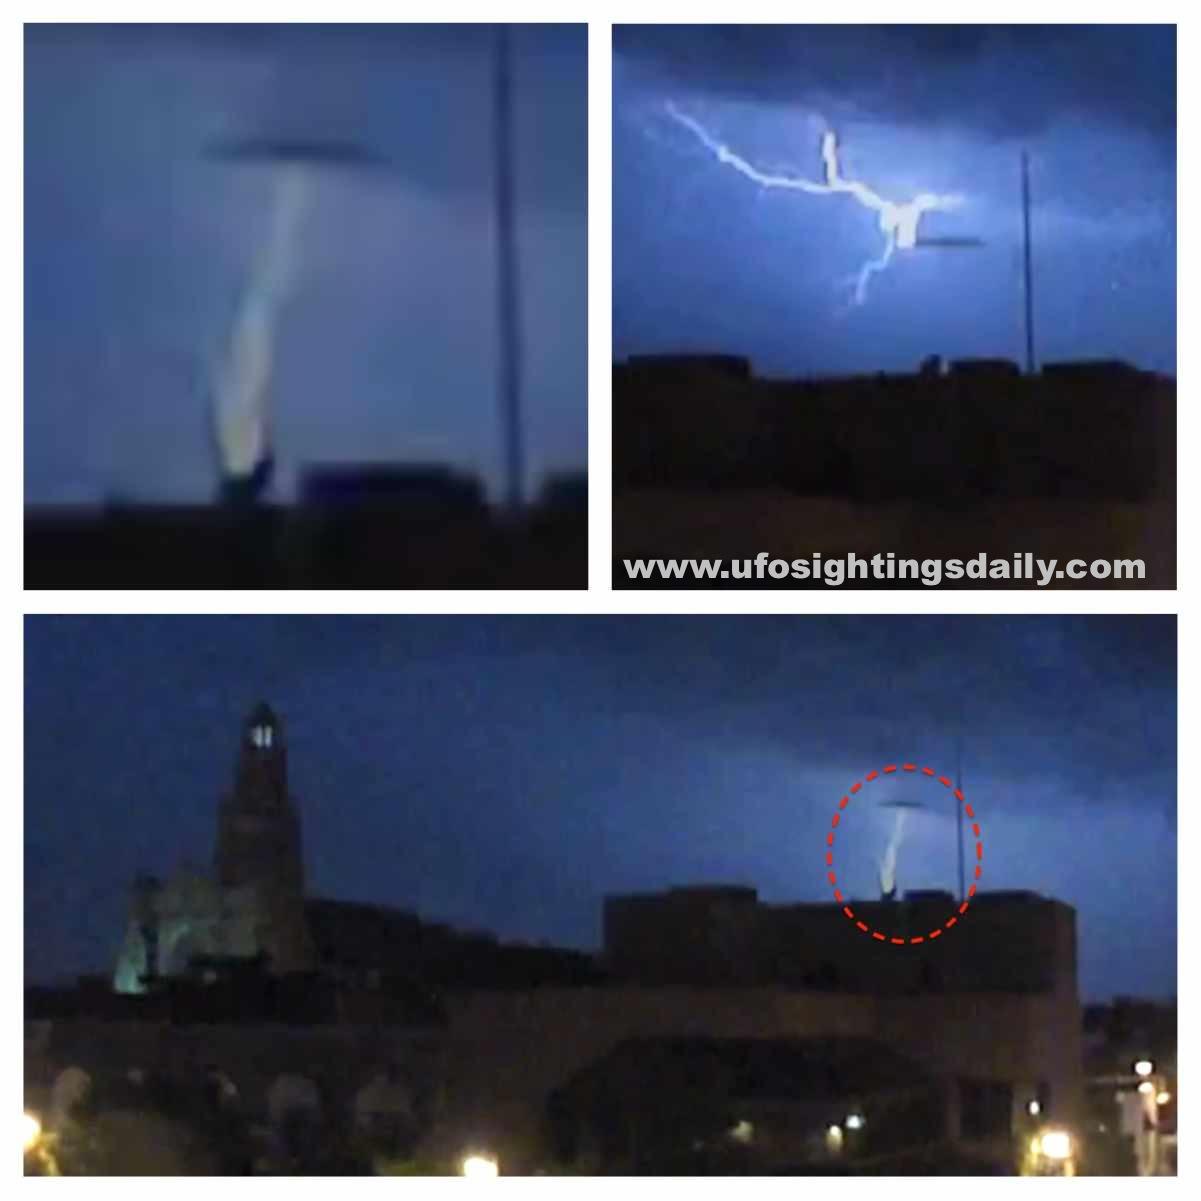 http://1.bp.blogspot.com/-u0gWXh6pdJg/UShjU28PrnI/AAAAAAAAO9s/E8Mb_tcc0fg/s1600/UFO,+UFOs,+sighting,+sightings,+storm,+thunder,+aliens,+NASA,+sky,+ESA,+MArs,+curiosity,+rover,+anomoly,+orb,+orbs,+Feb,+2013,+world,+news,+Justin,+Bieber,+Selena,+Gomez,.jpg